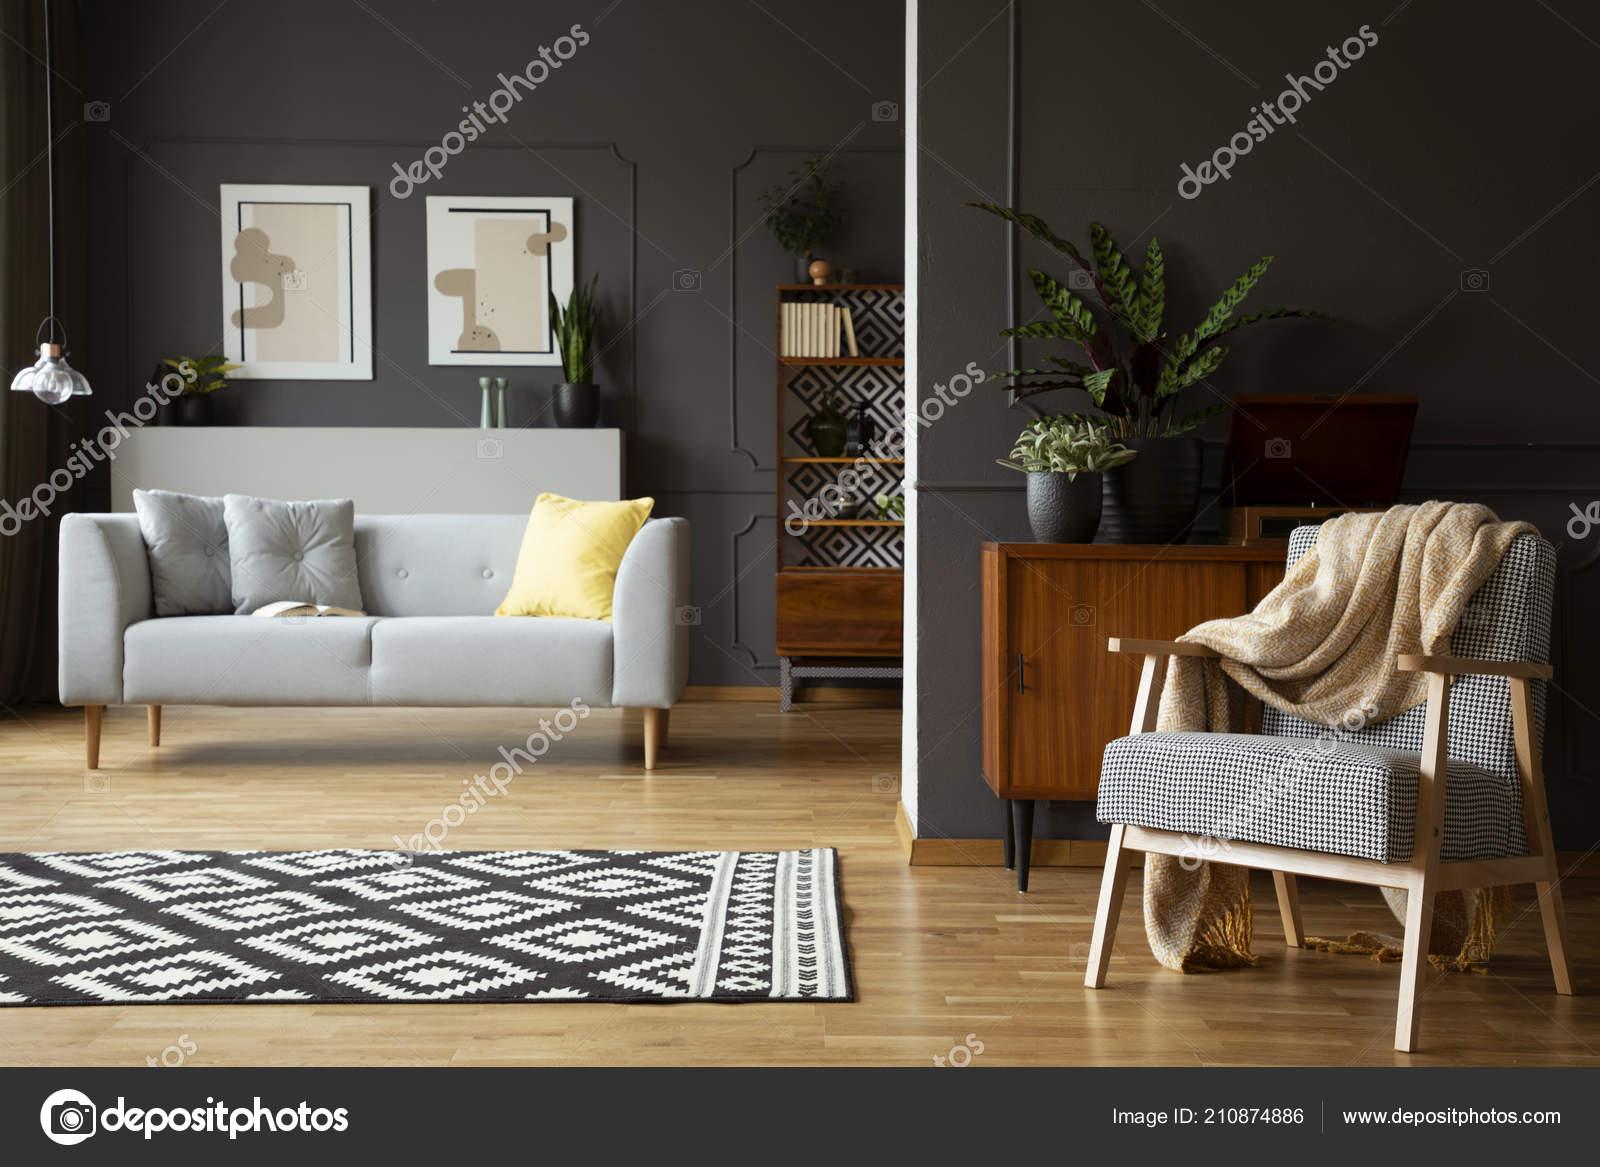 Awe Inspiring Blanket Armchair Living Room Interior Patterned Carpet Grey Pdpeps Interior Chair Design Pdpepsorg